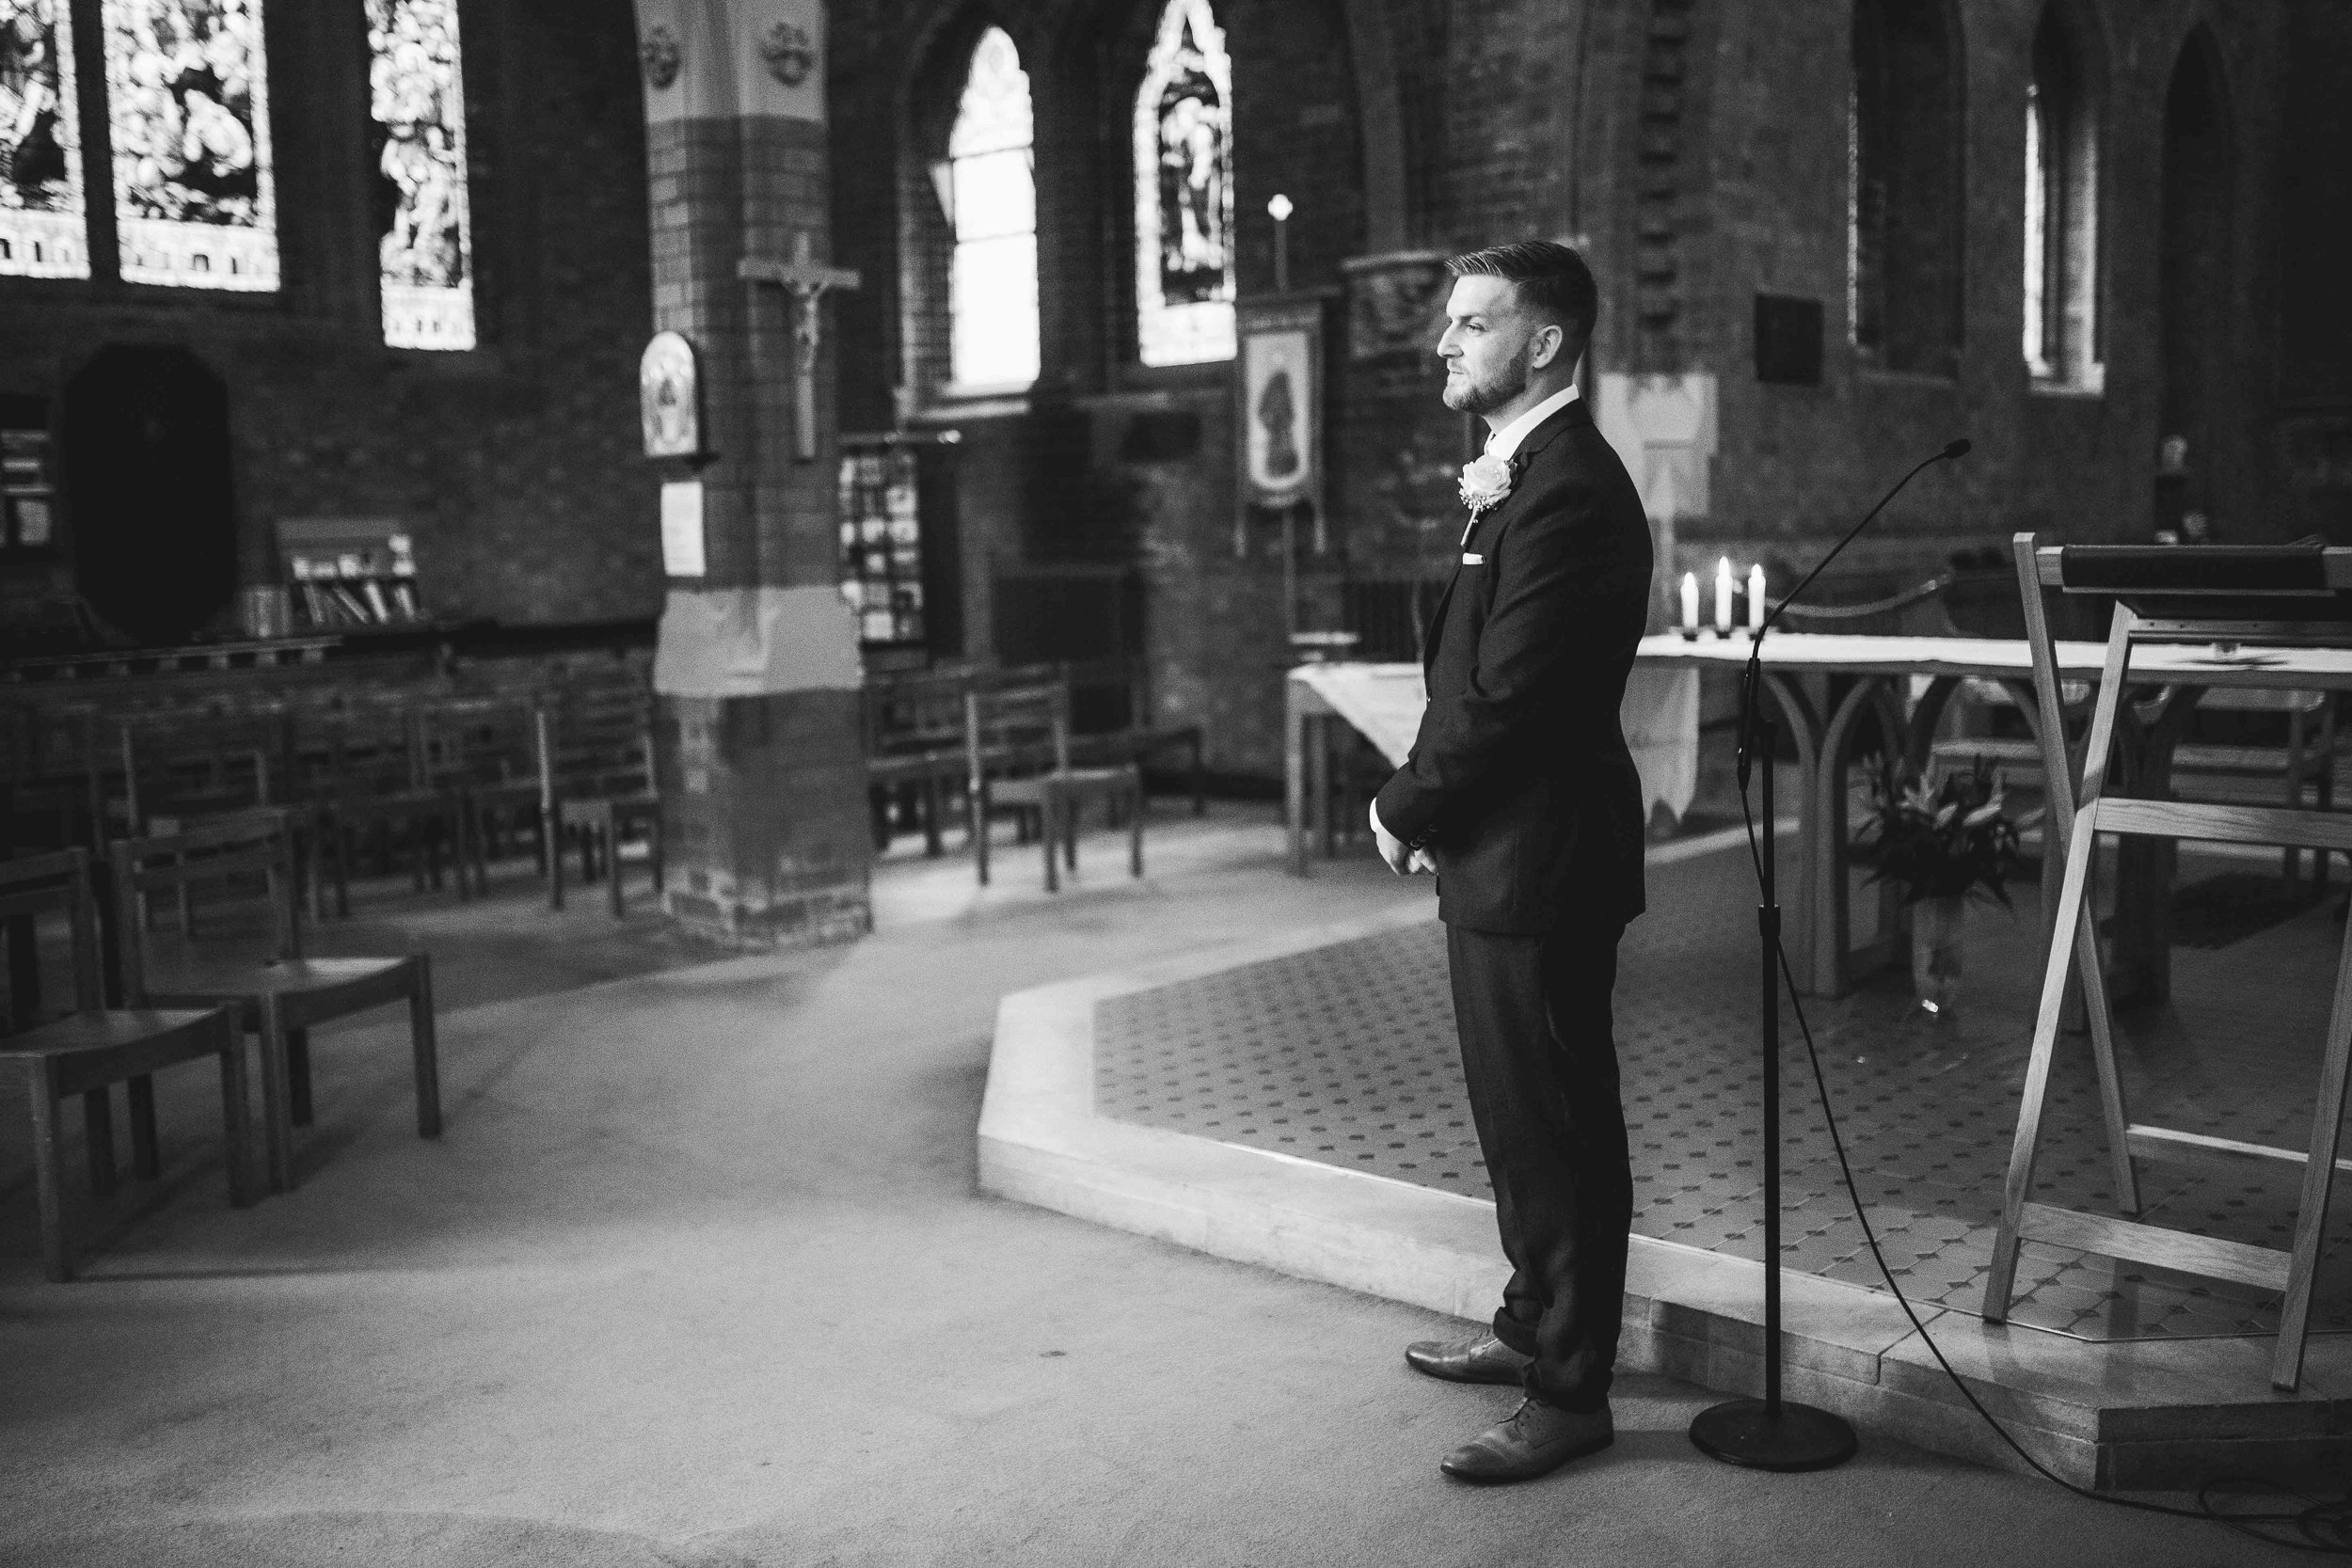 Lea-cooper-photography-willenhall-wolverhampton-wedding-photographer-birmingham-shirley-west-midlands-ceremony-church-8.JPG